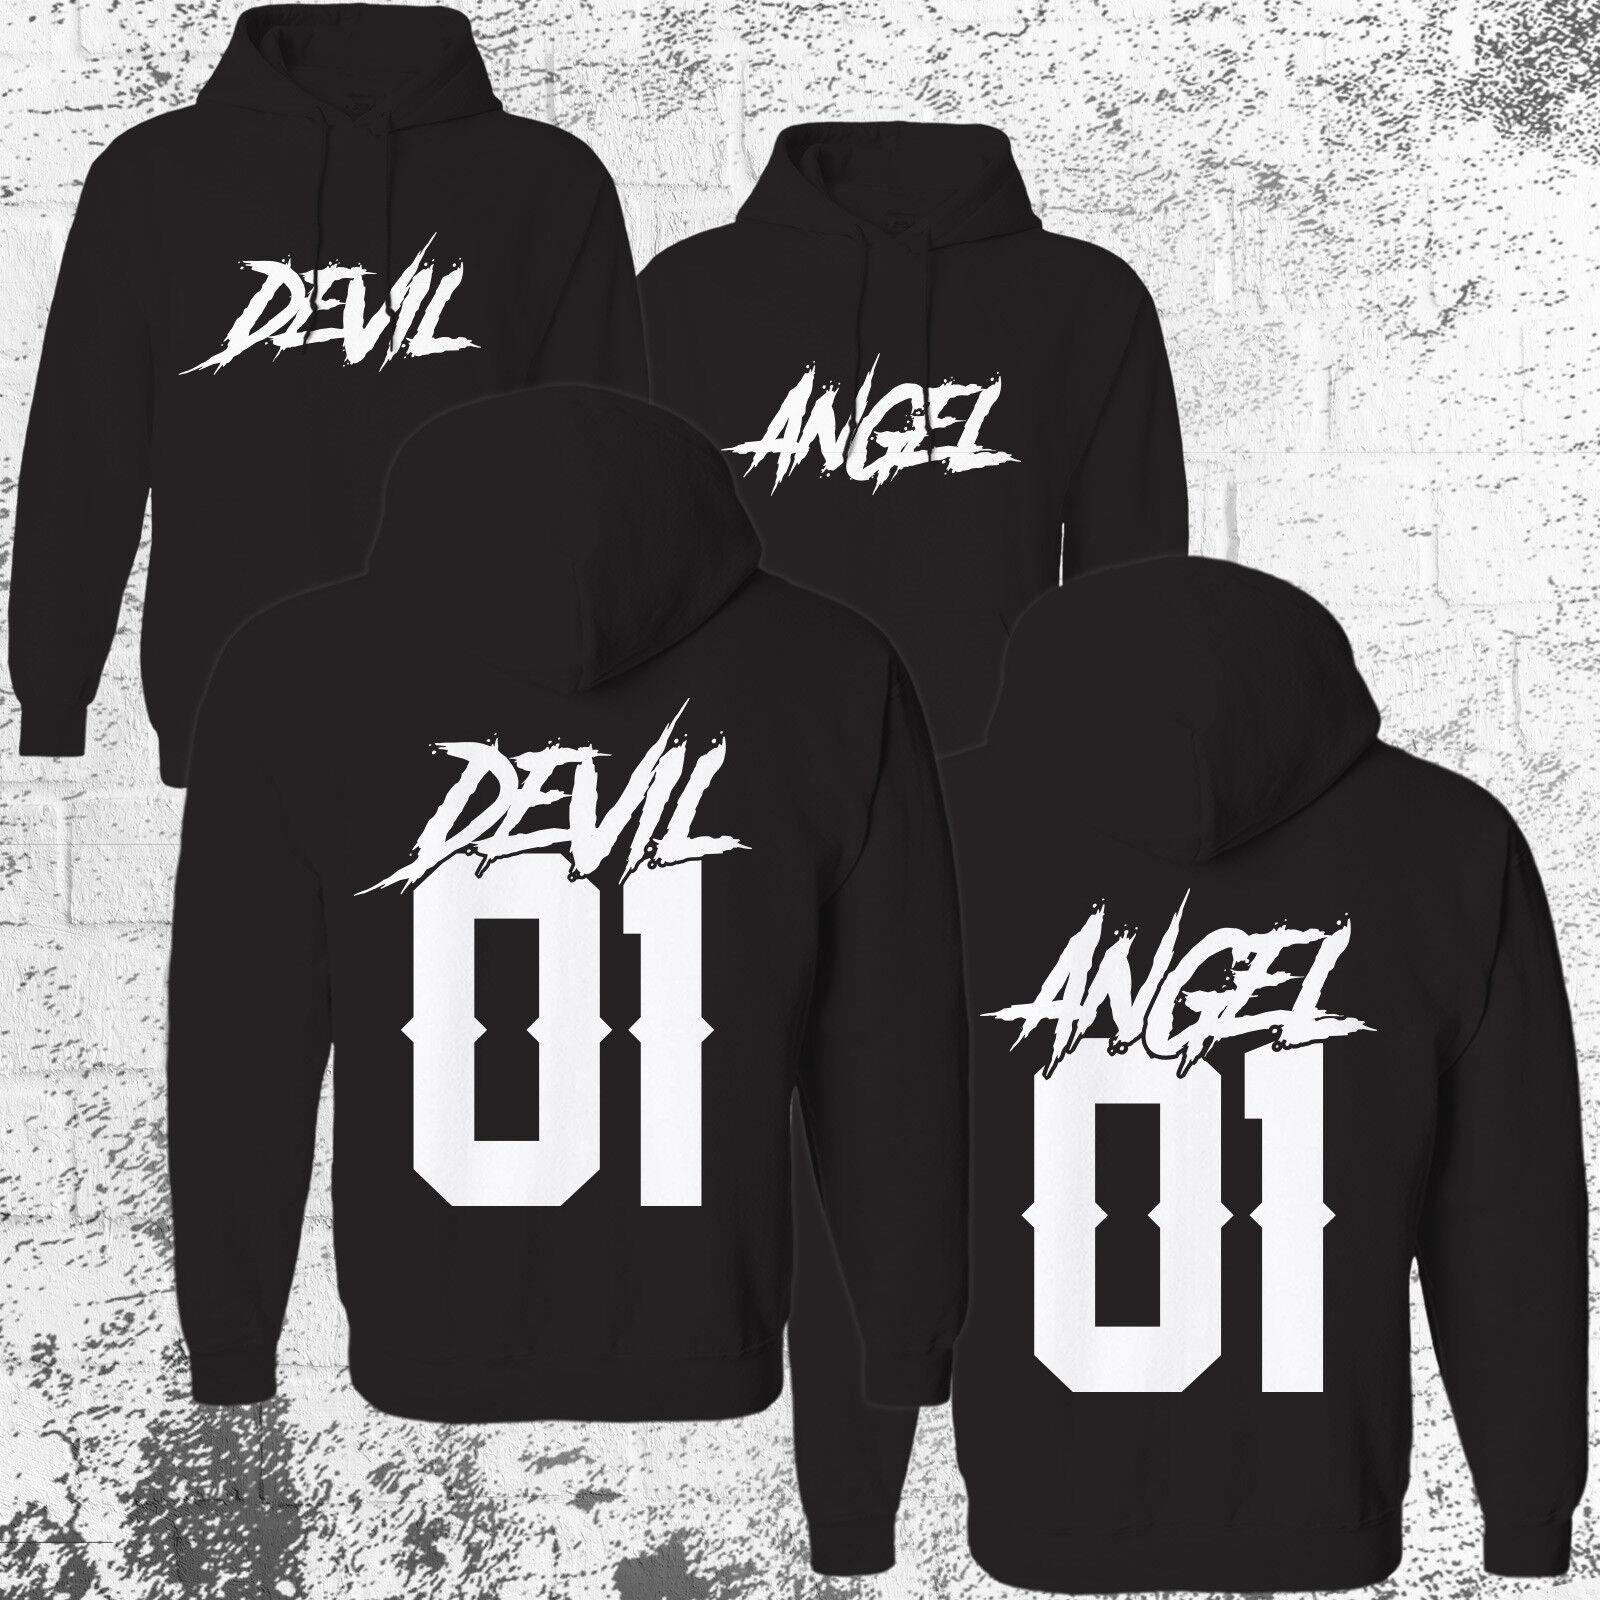 Devil 01 Angel 01 Hoodie SET Pullover Pulli Pärchen Couple Paar NO King Queen